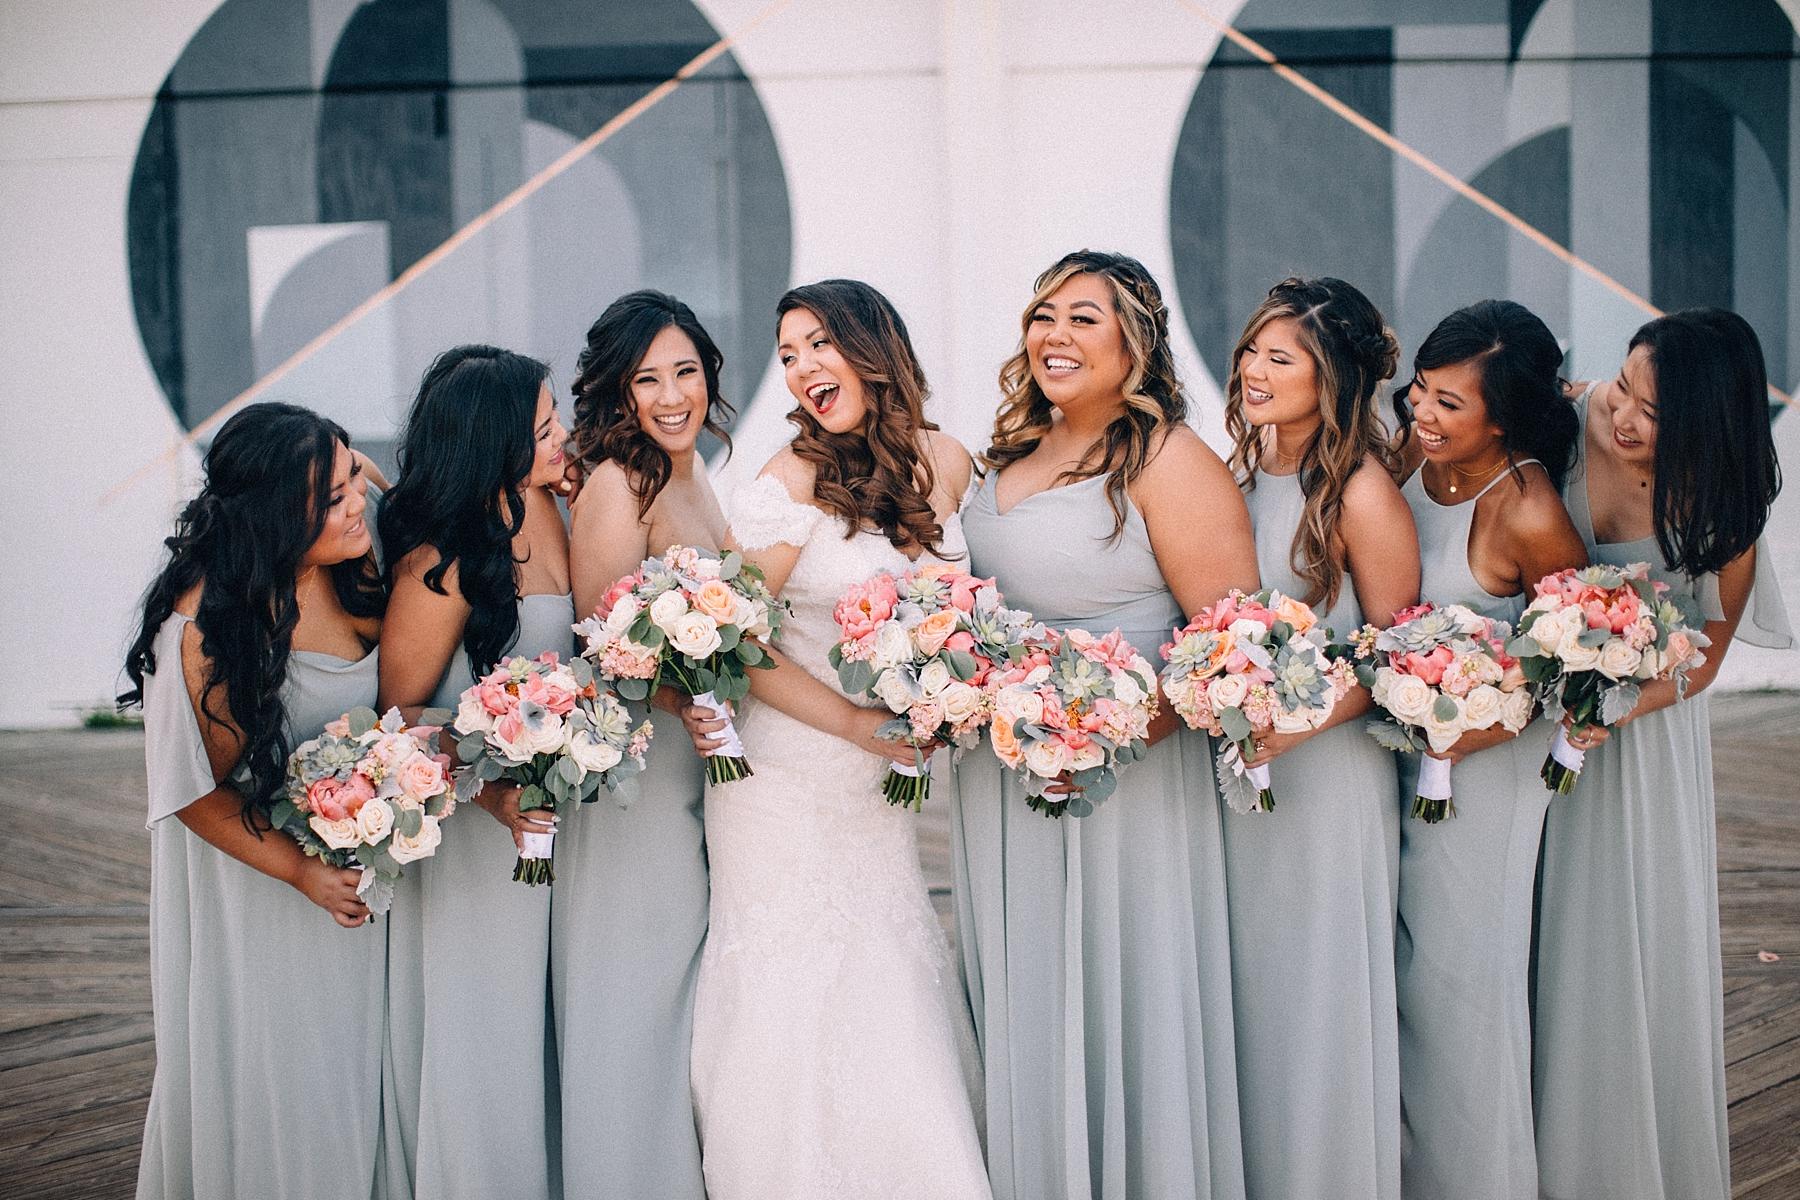 new_jersey_wedding_the_Berkeley_beach_asbury_photographer_0039.jpg